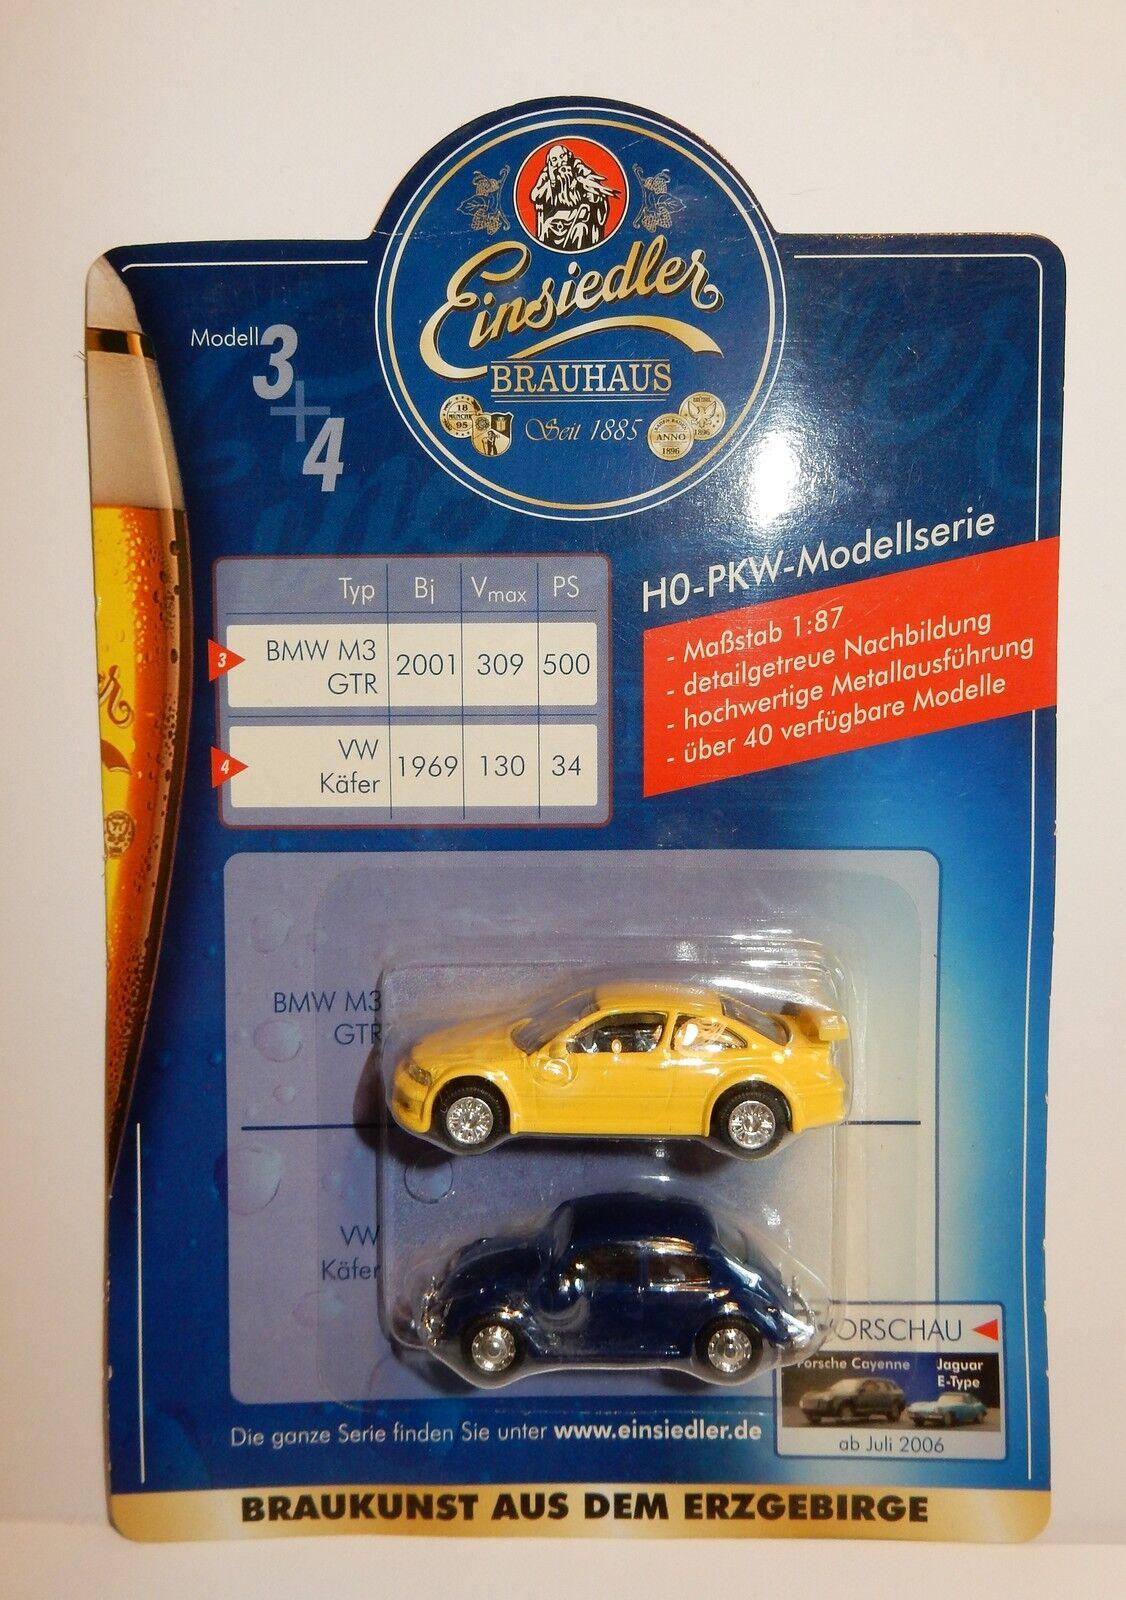 EINSIEDLER BRAUHAUS BEER HO 1 87 BMW M3 GTR 2001 VW KAFER 1969 METAL BRAUKUNST